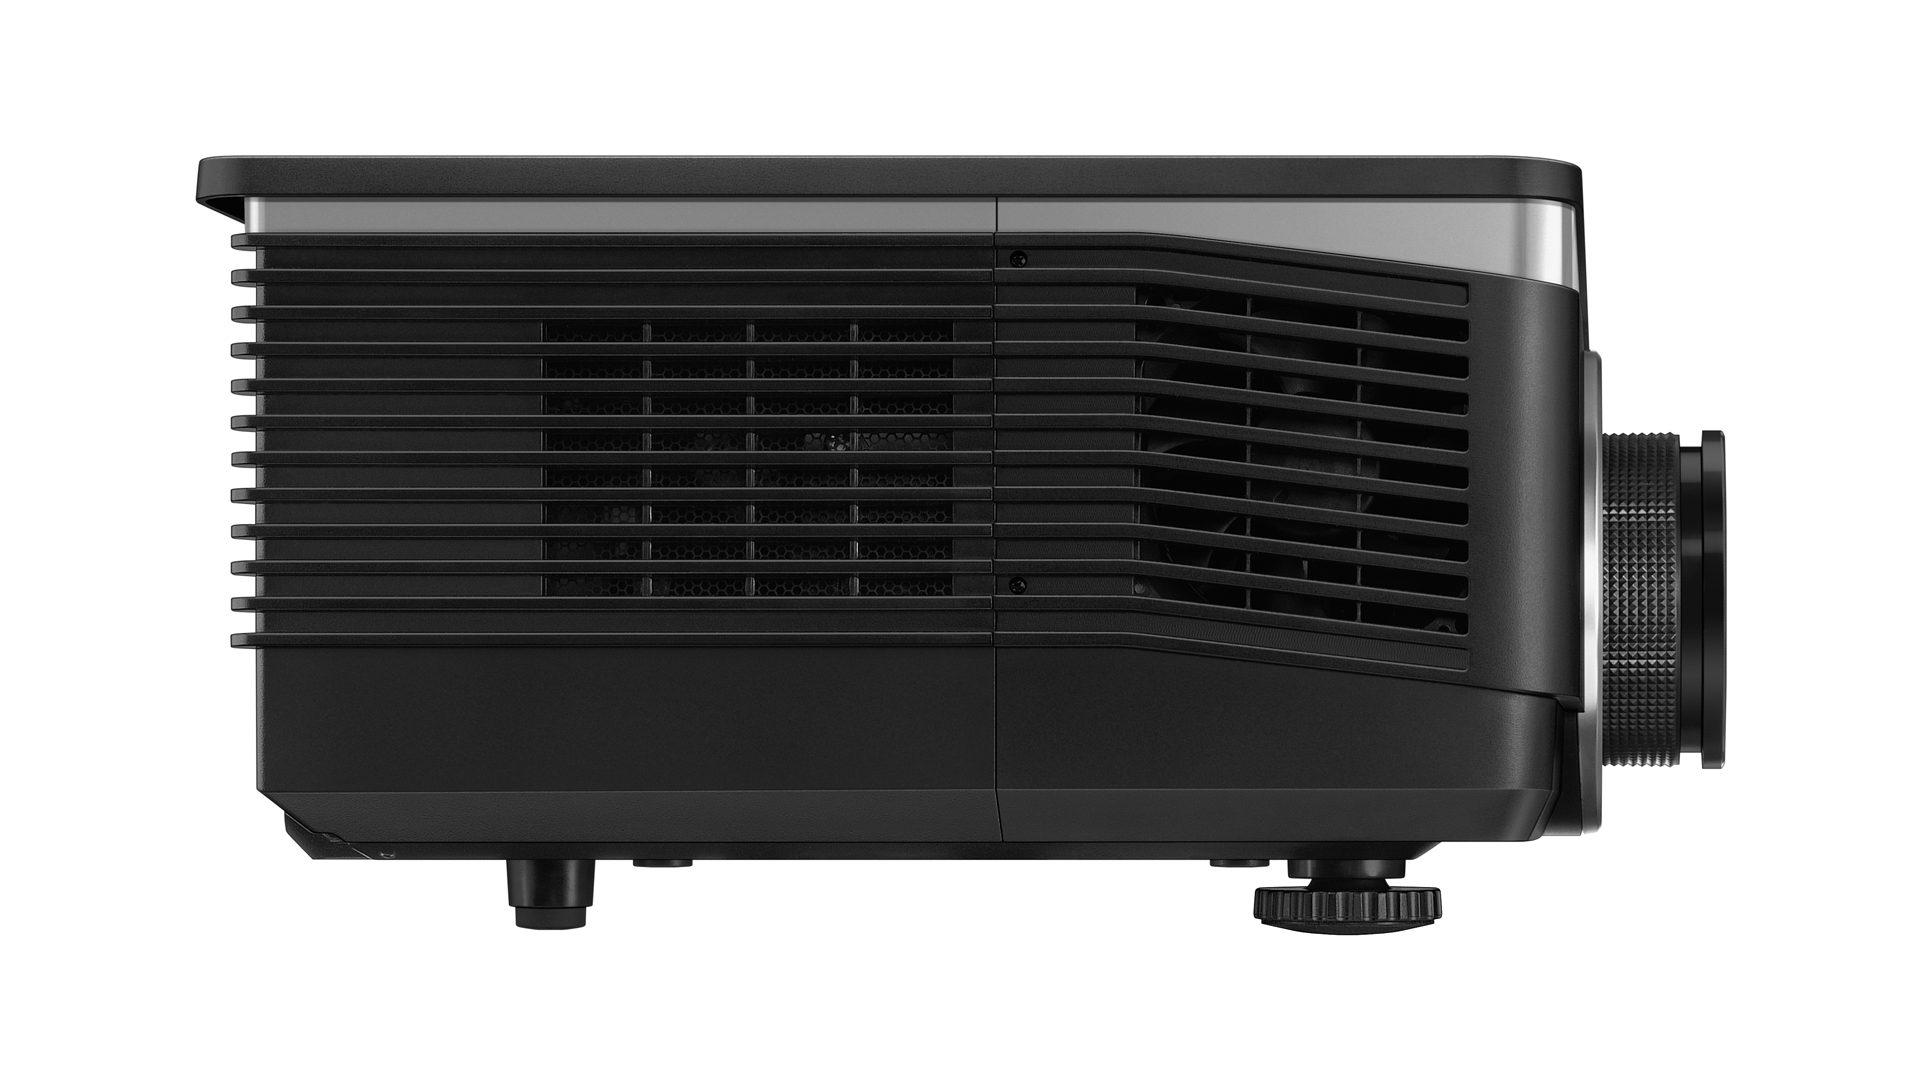 BenQ-W8000-7